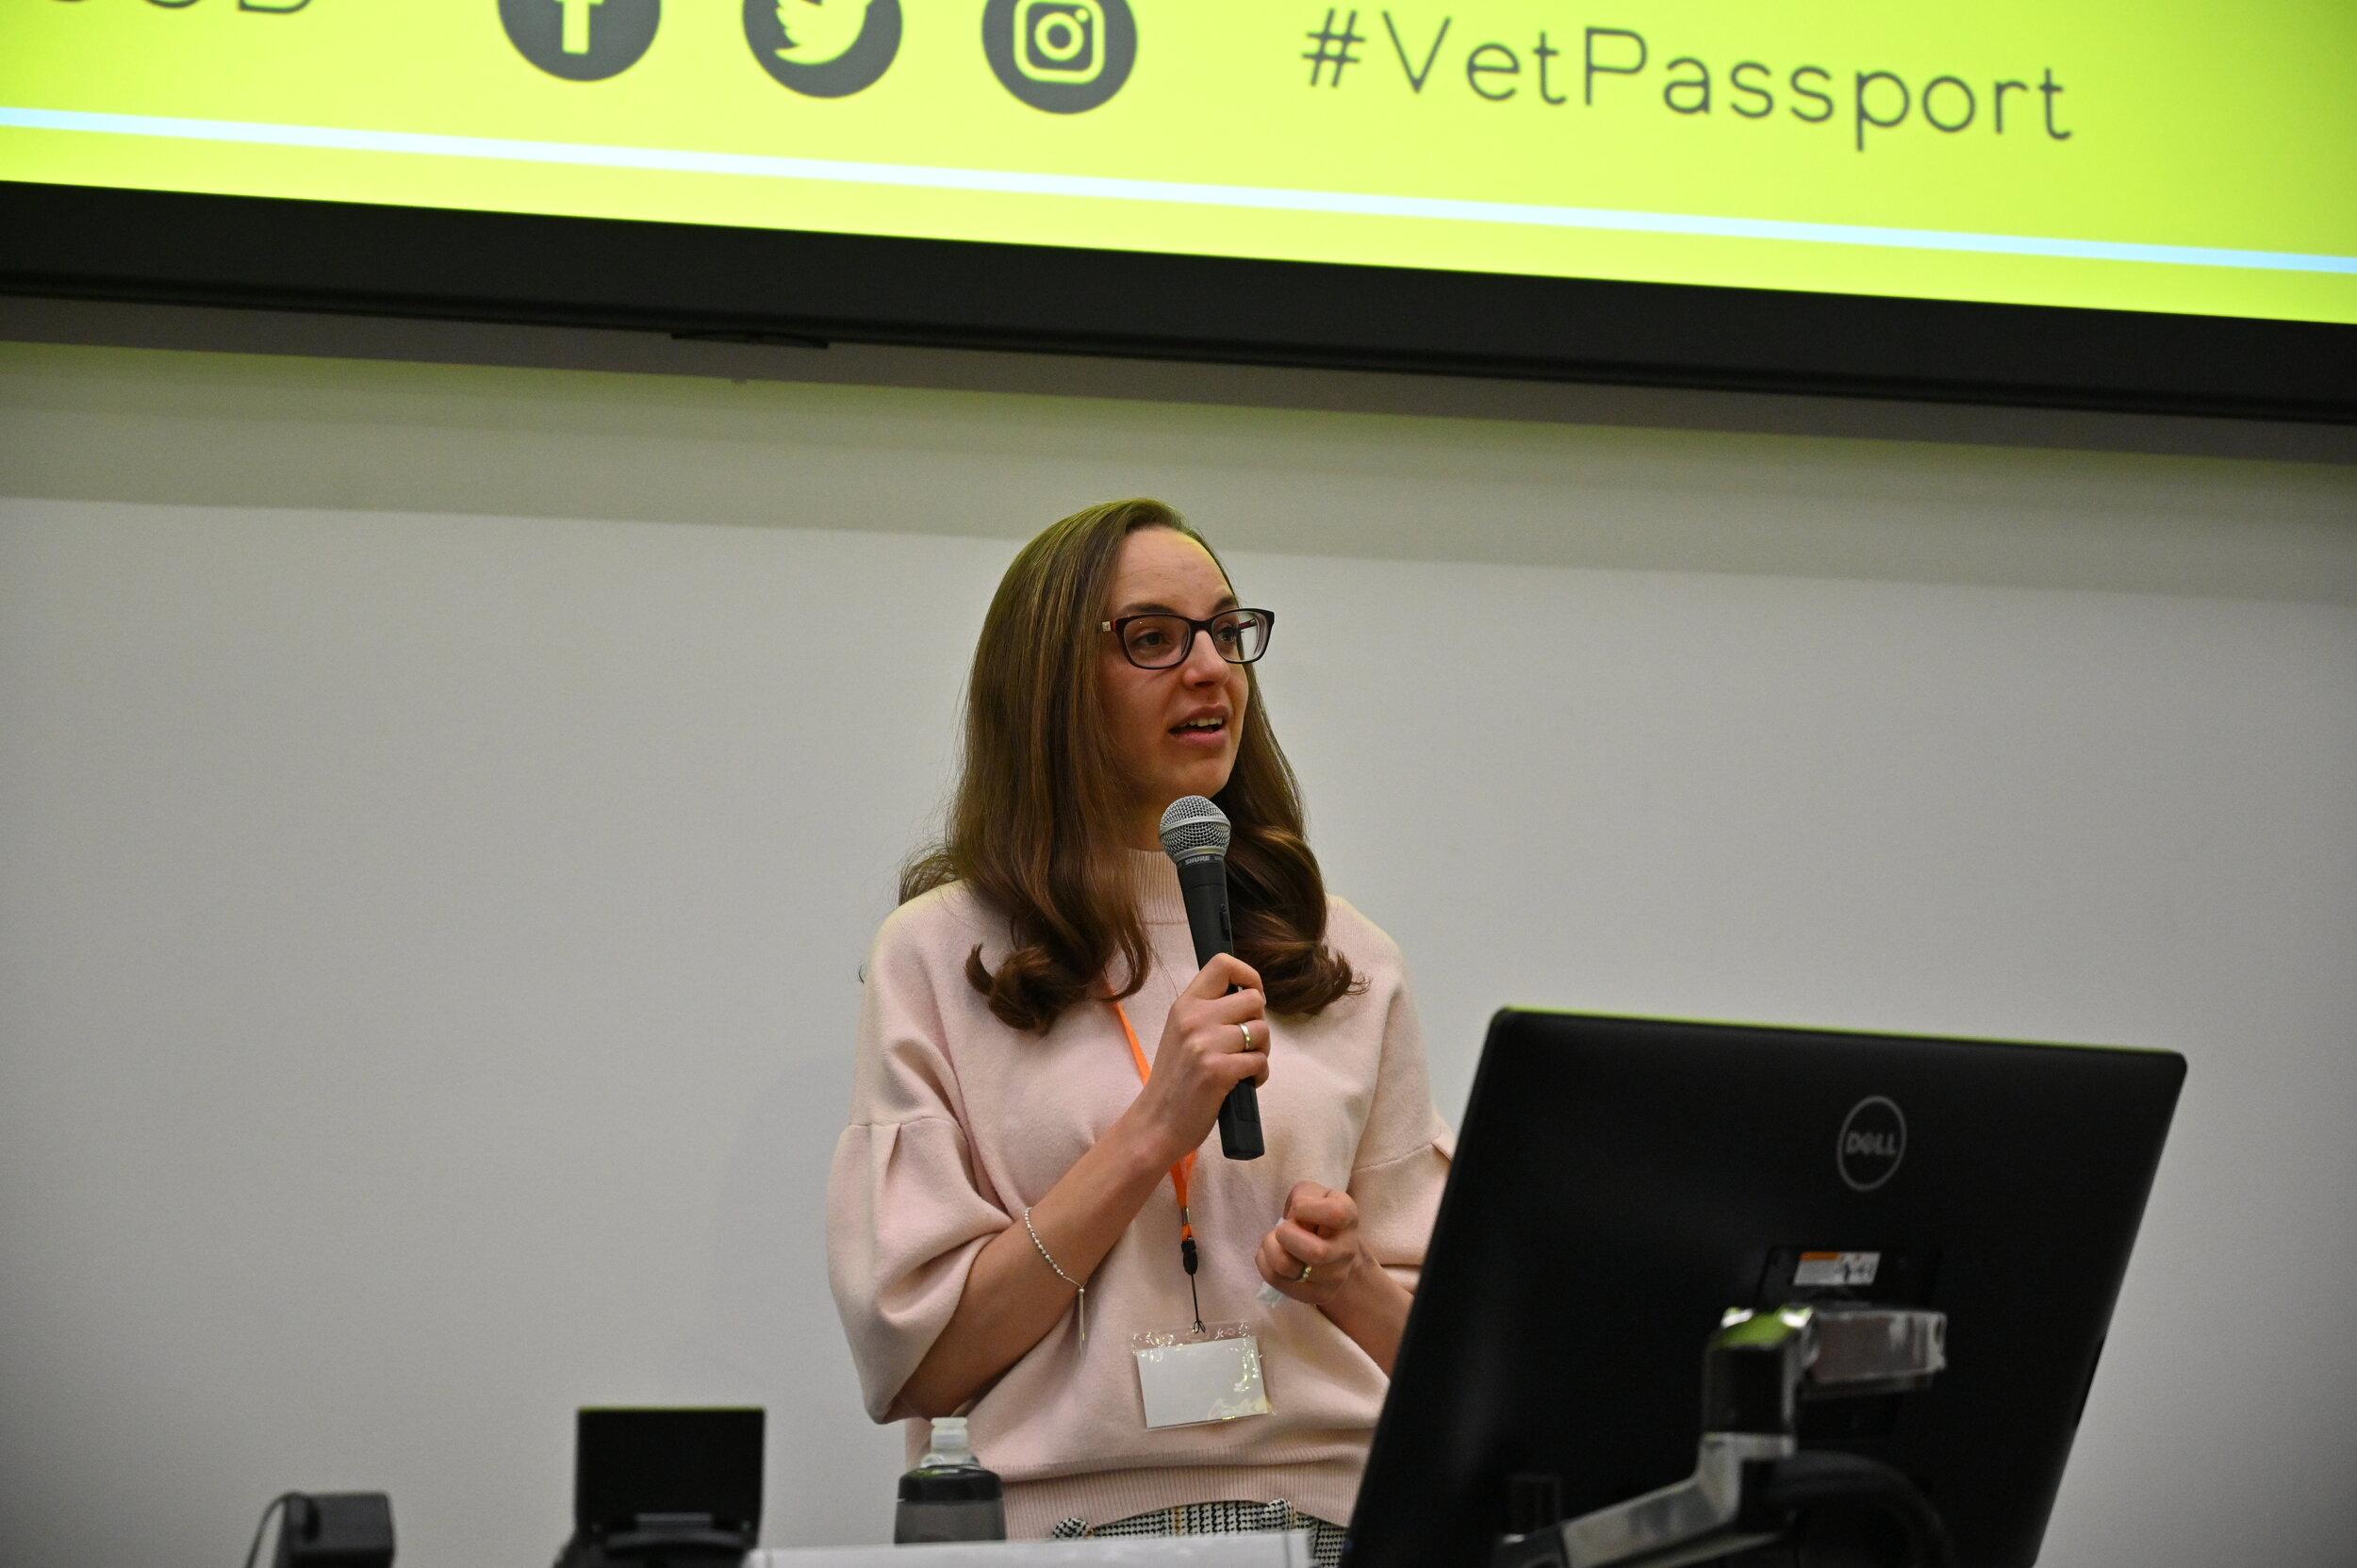 Lizzie Erian presenting at the Vet Passport Roadshow evening with VSGD and SPVS at Surrey Vet School